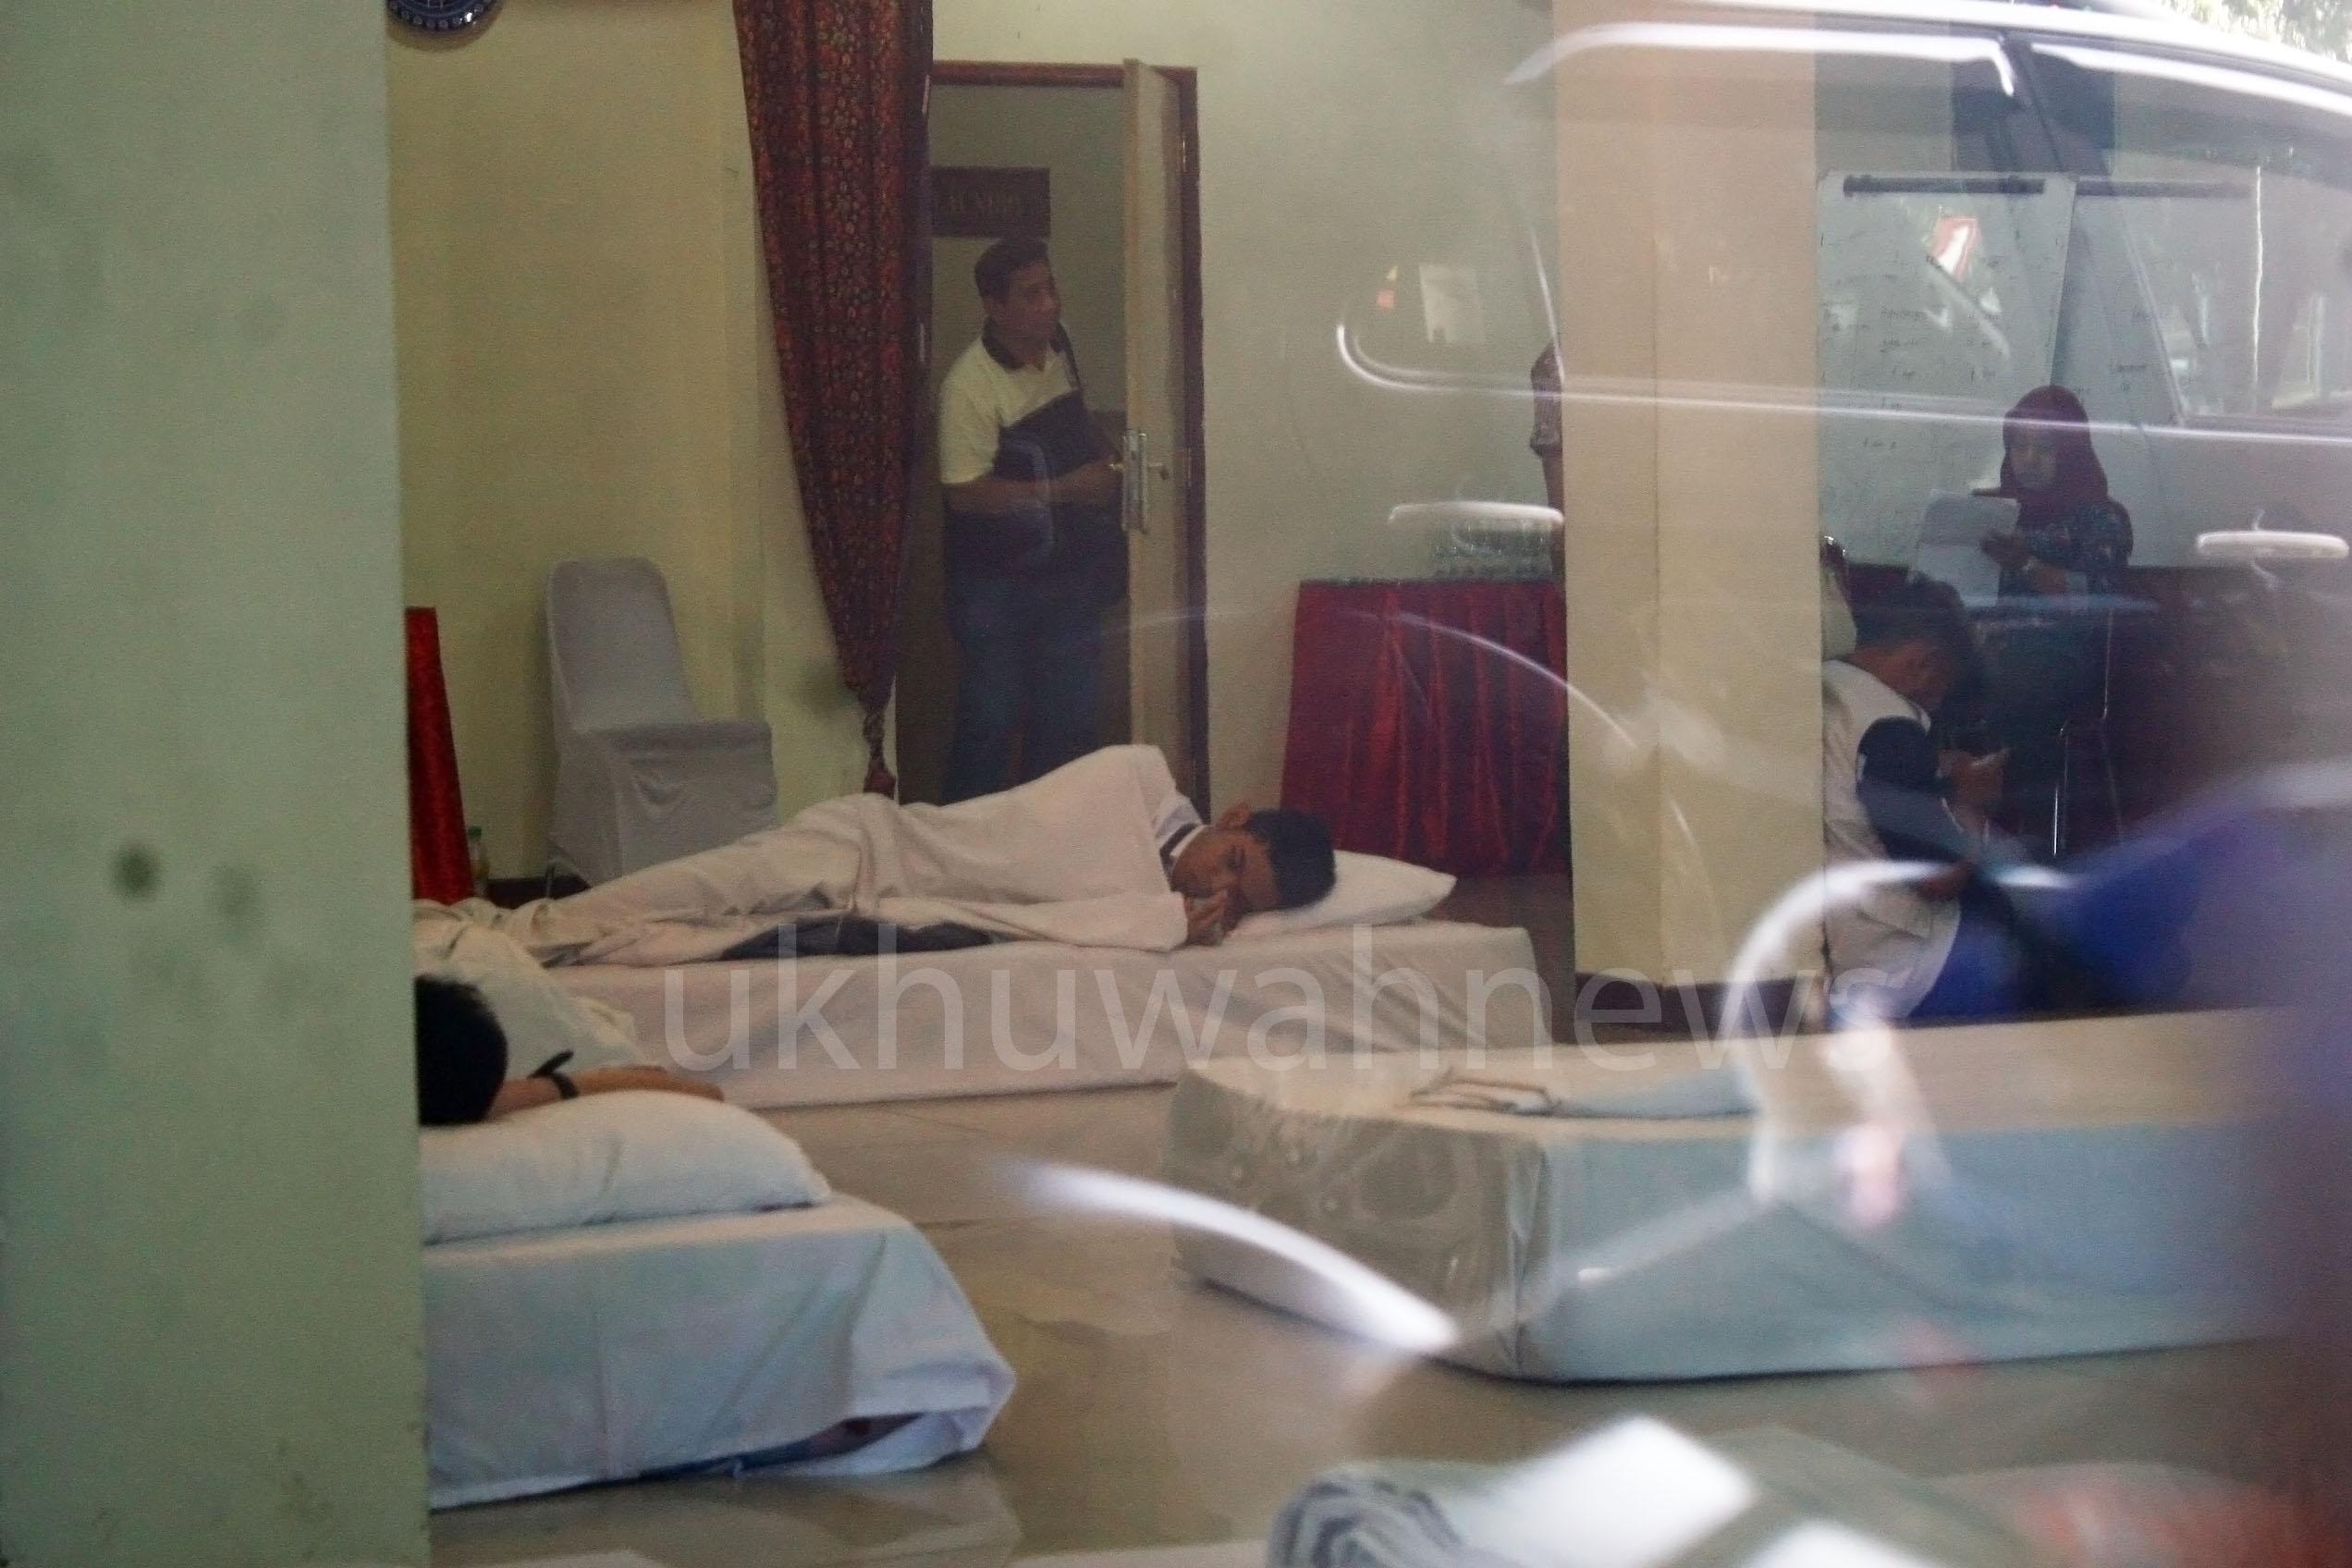 Siswa peserta Olimpiade Sains Nasional (OSN) sedang beristirahat pasca keracunan makanan, di Hotel Grand Duta Palembang, Pada Selasa (17/05/16).Foto:Obi/Ukhuwahnews.com